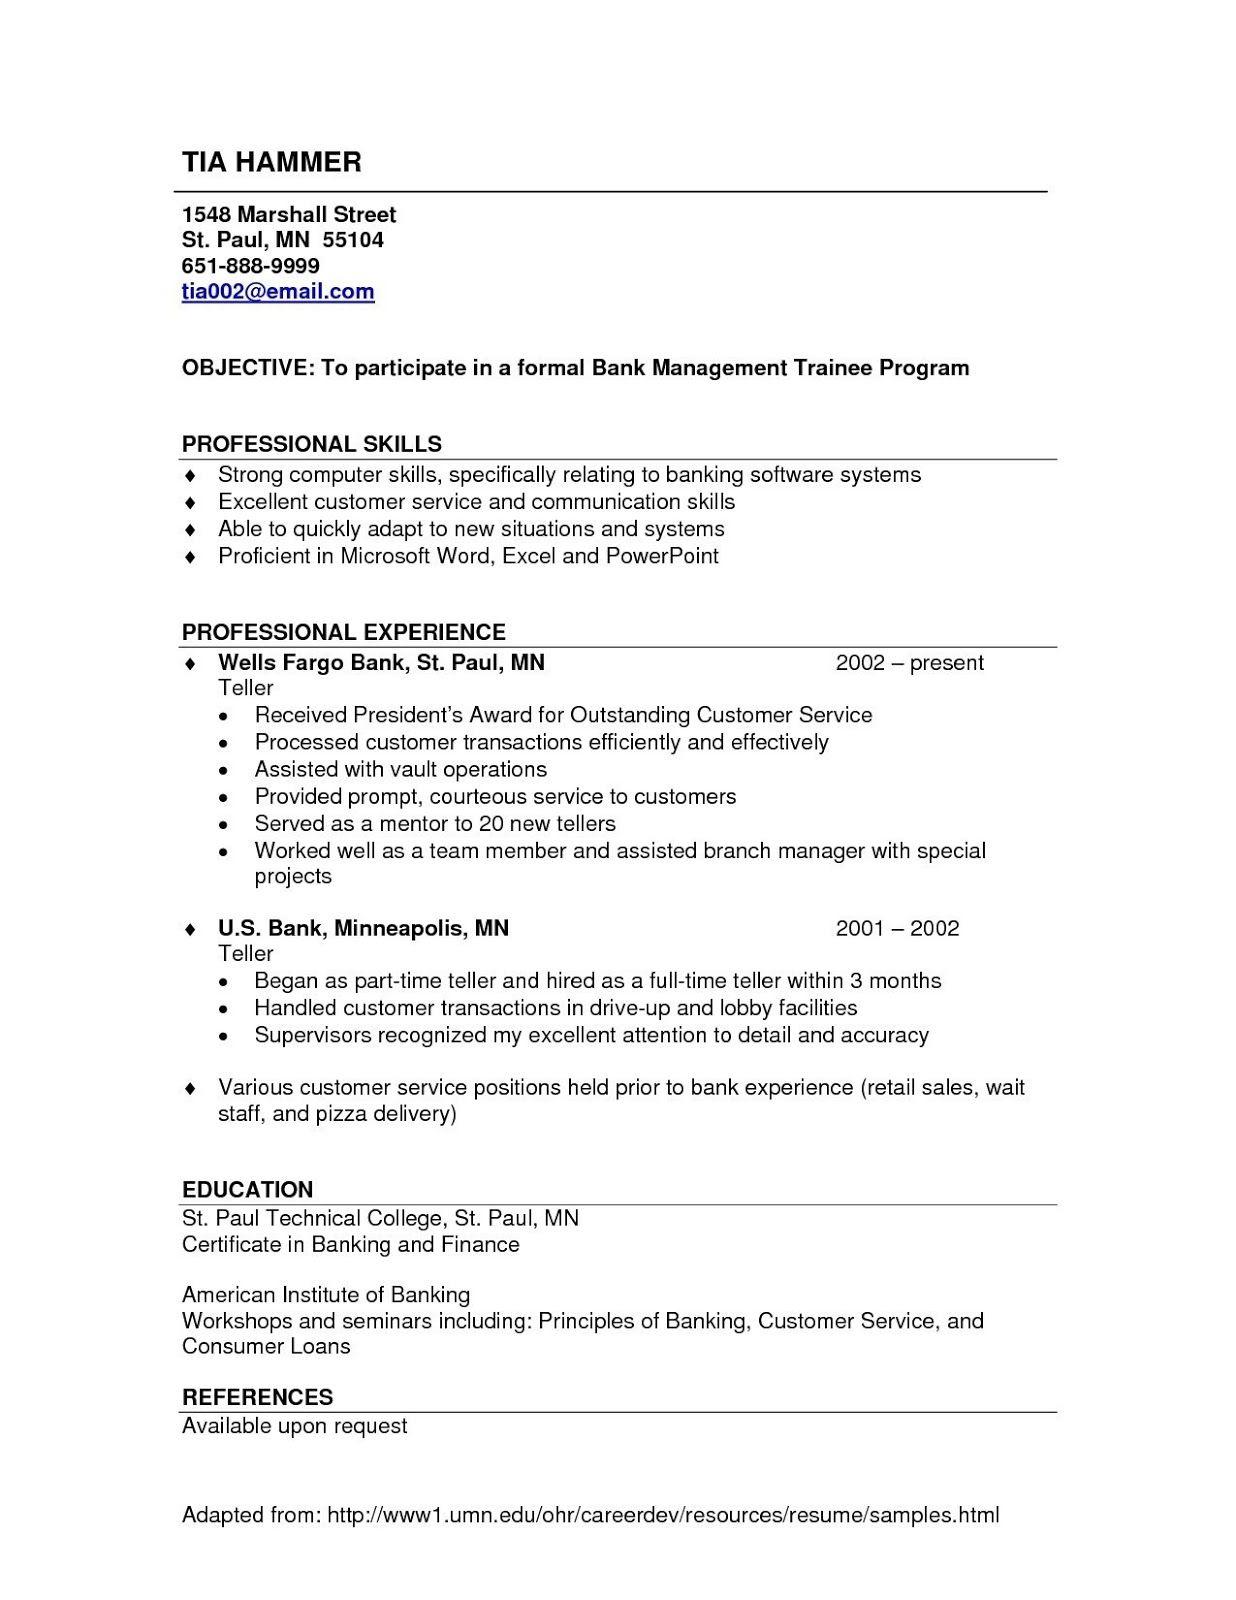 Bank Resume Template 2019 Bank Resume Template For